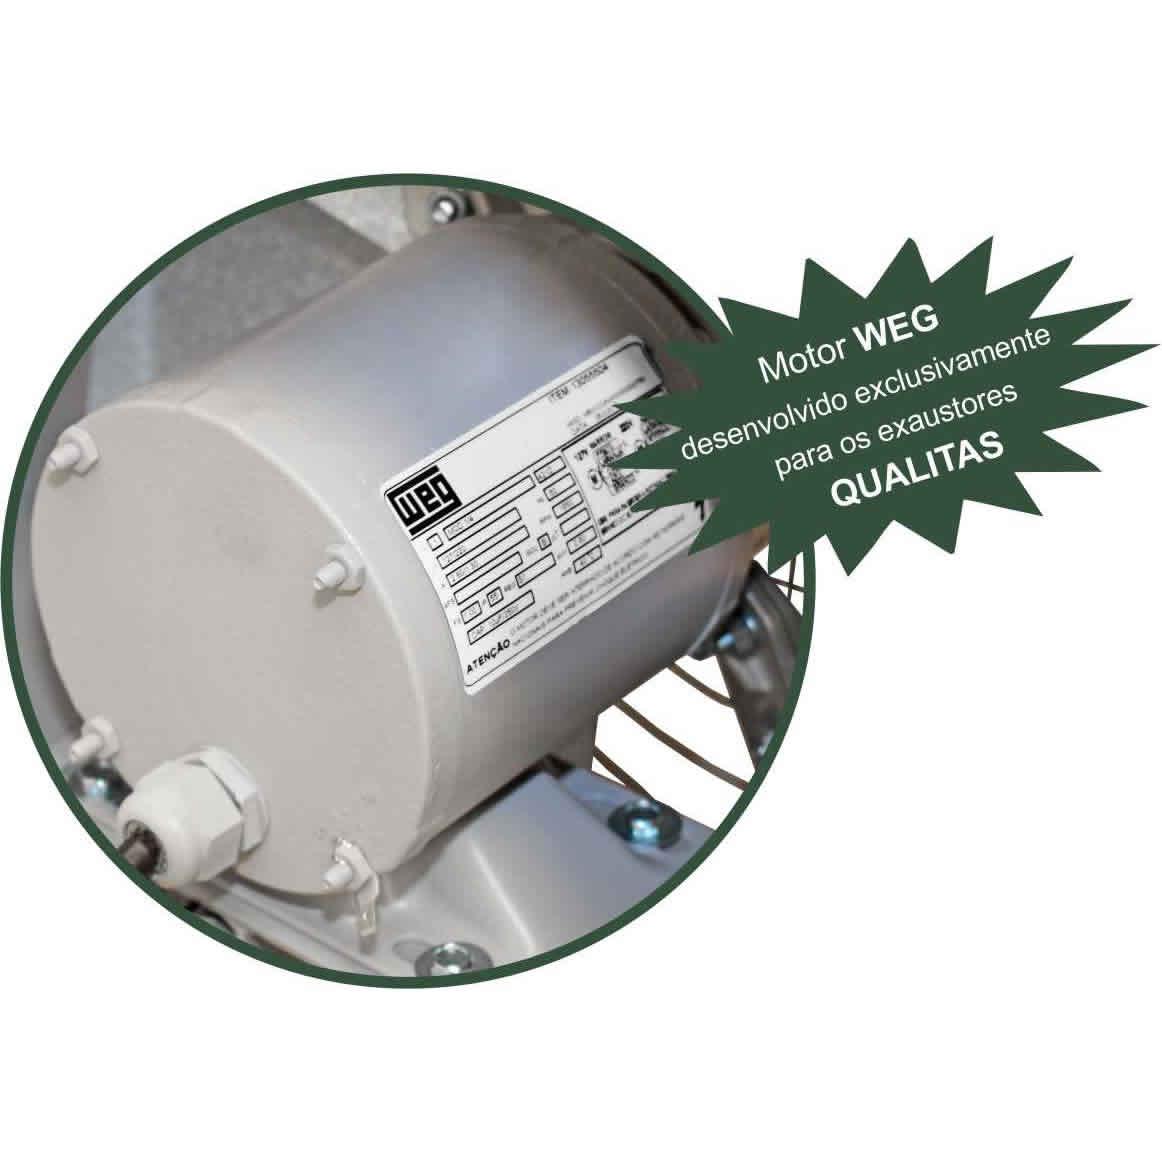 Exaustor Axial Ø30cm | EQ300 Motor WEG - Qualitas